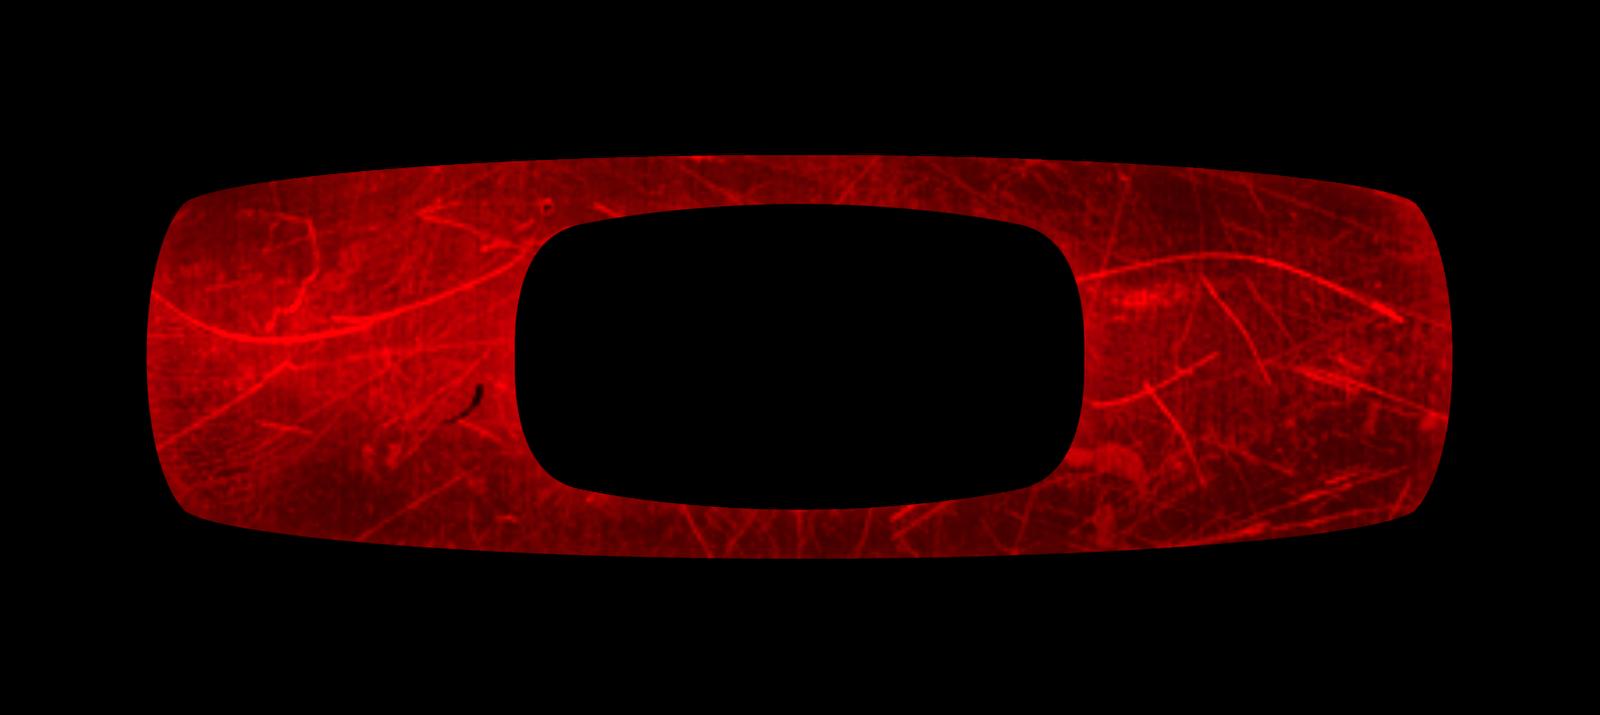 oakley symbol  Oakley Logo Images - Ficts